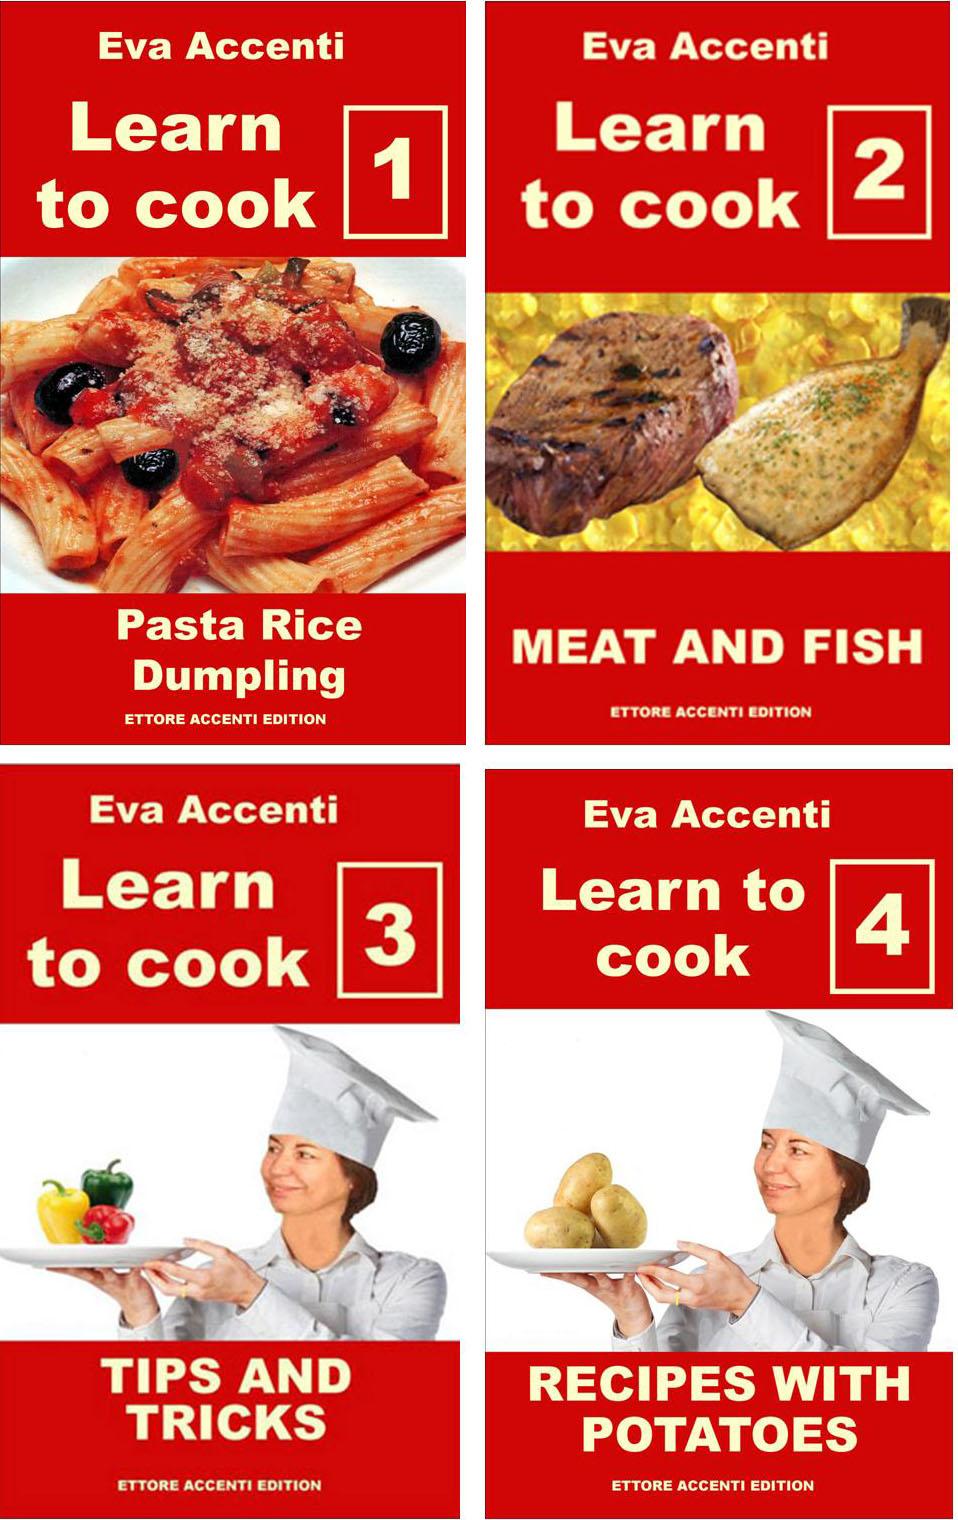 Ettore accenti blog impara a cucinare 8 ebook for Cucinare in inglese